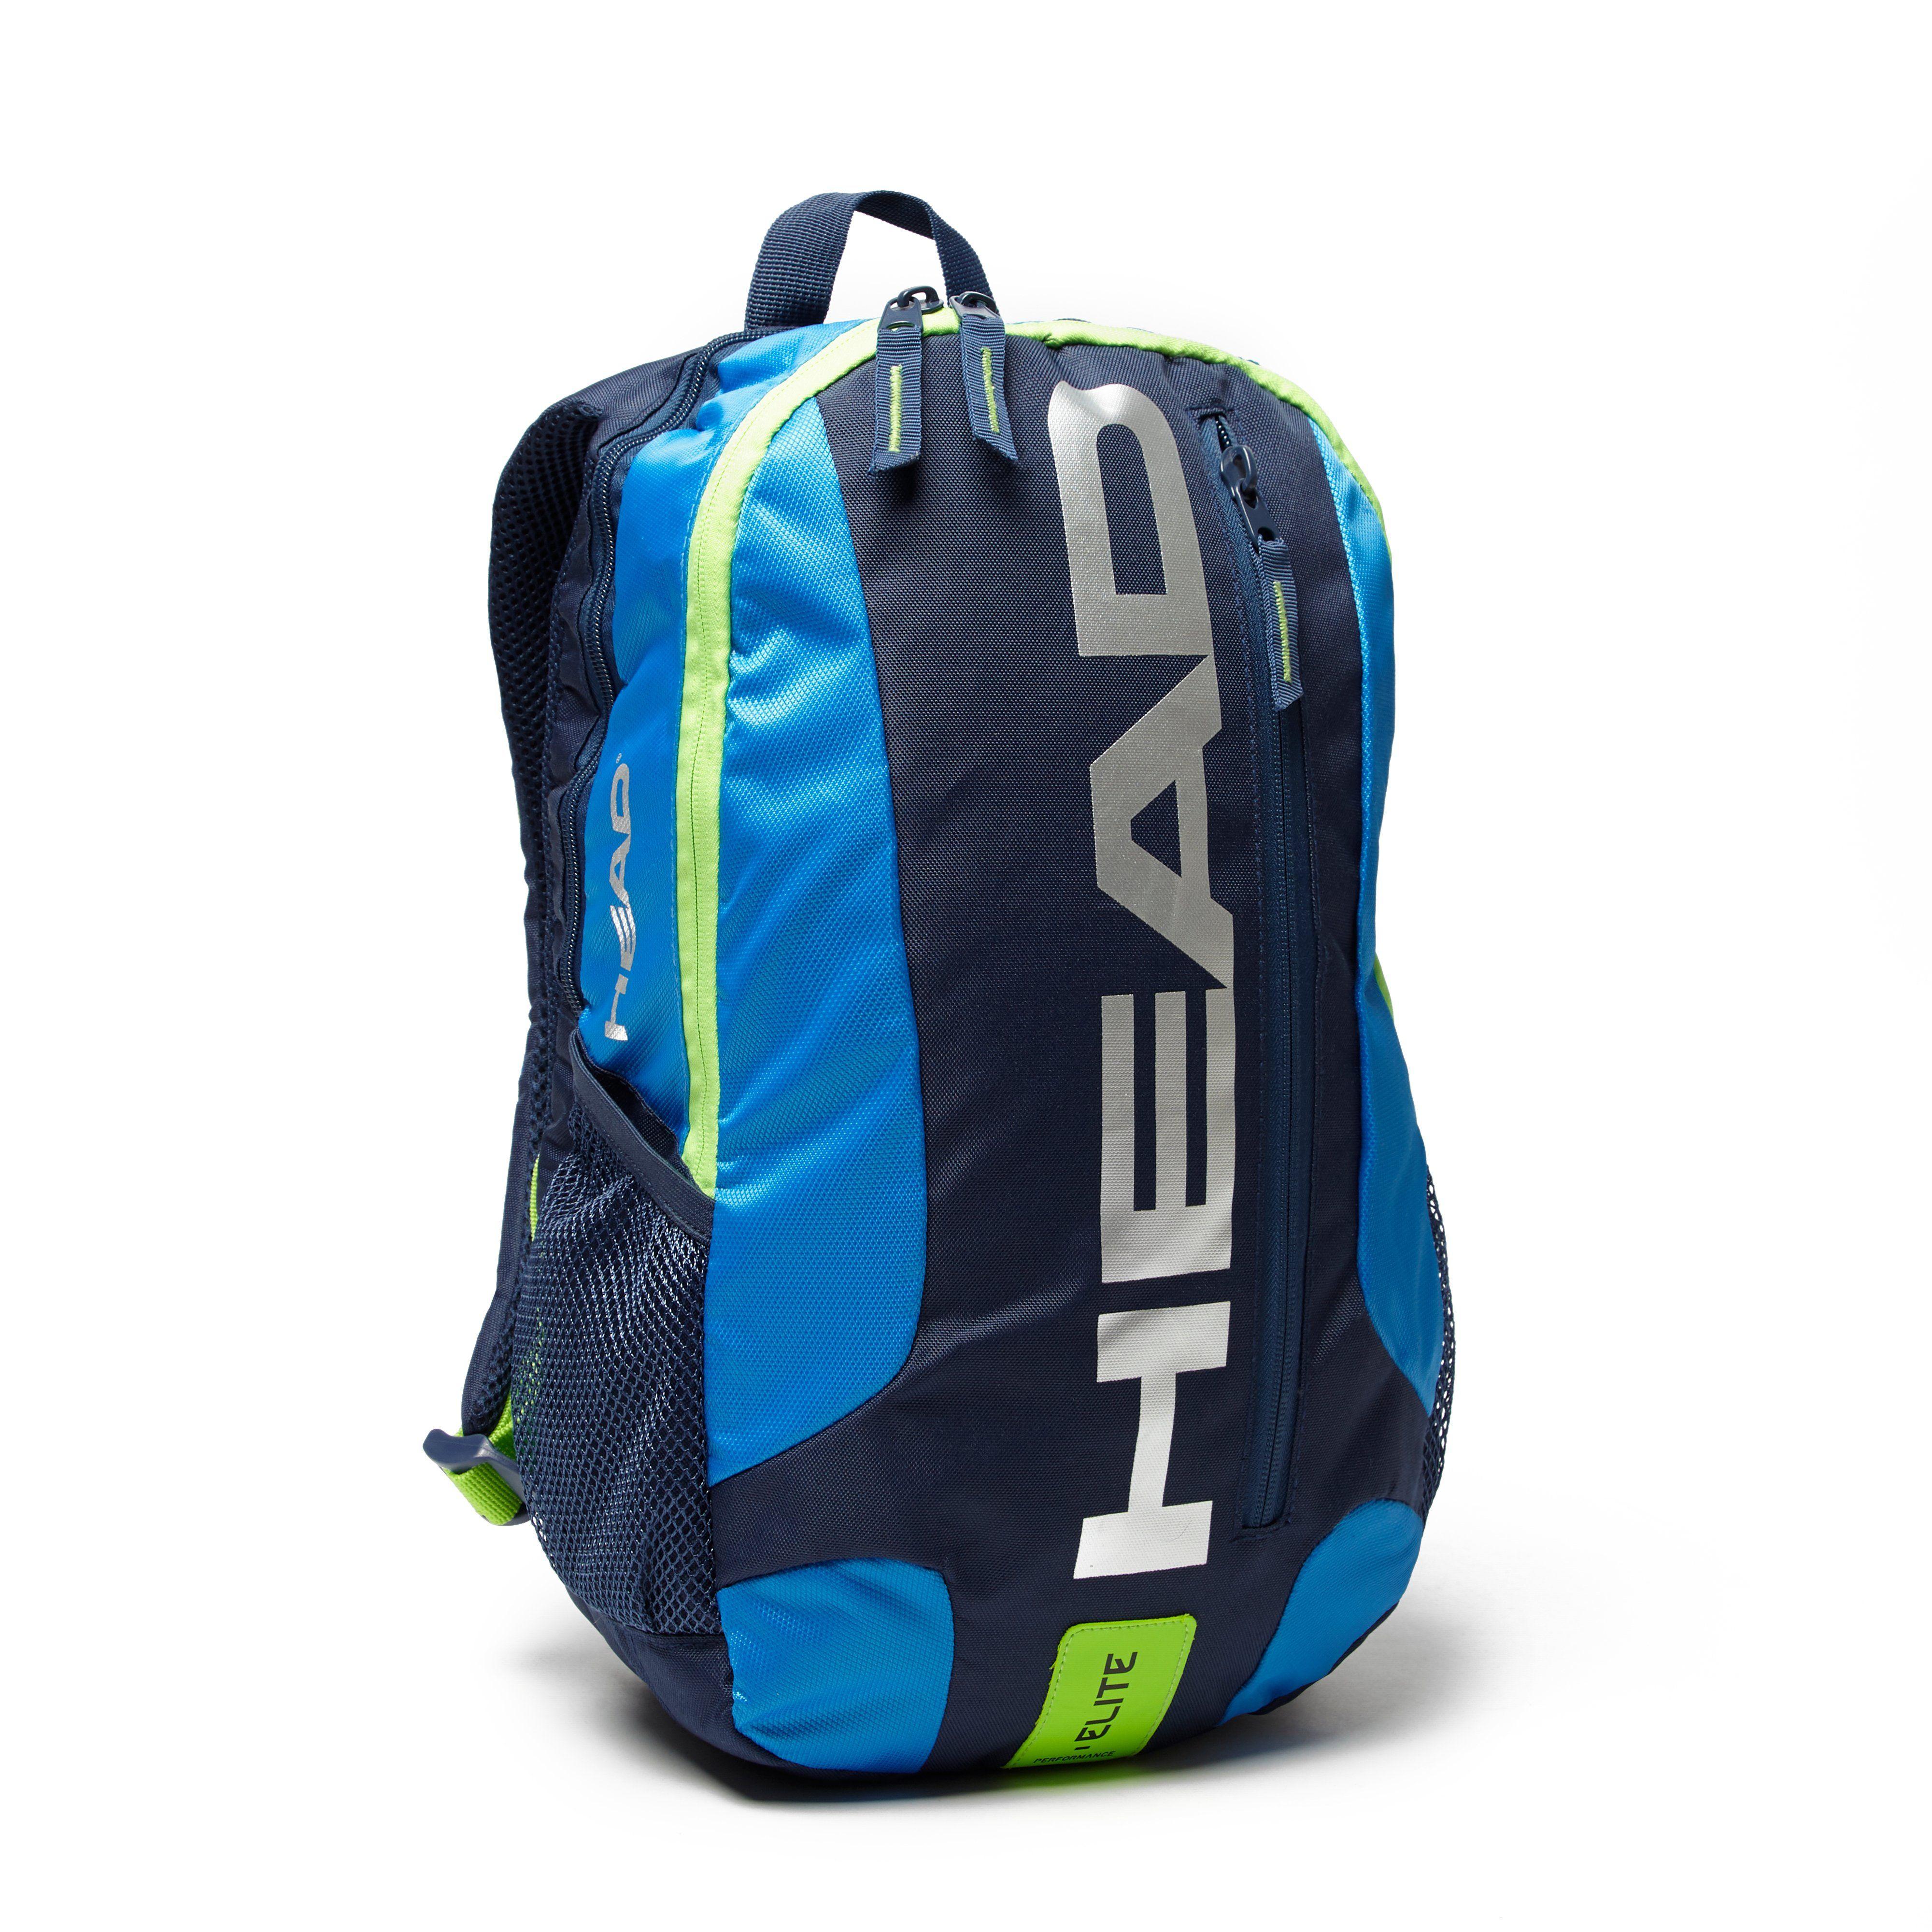 Head Elite x2 Racket Backpack